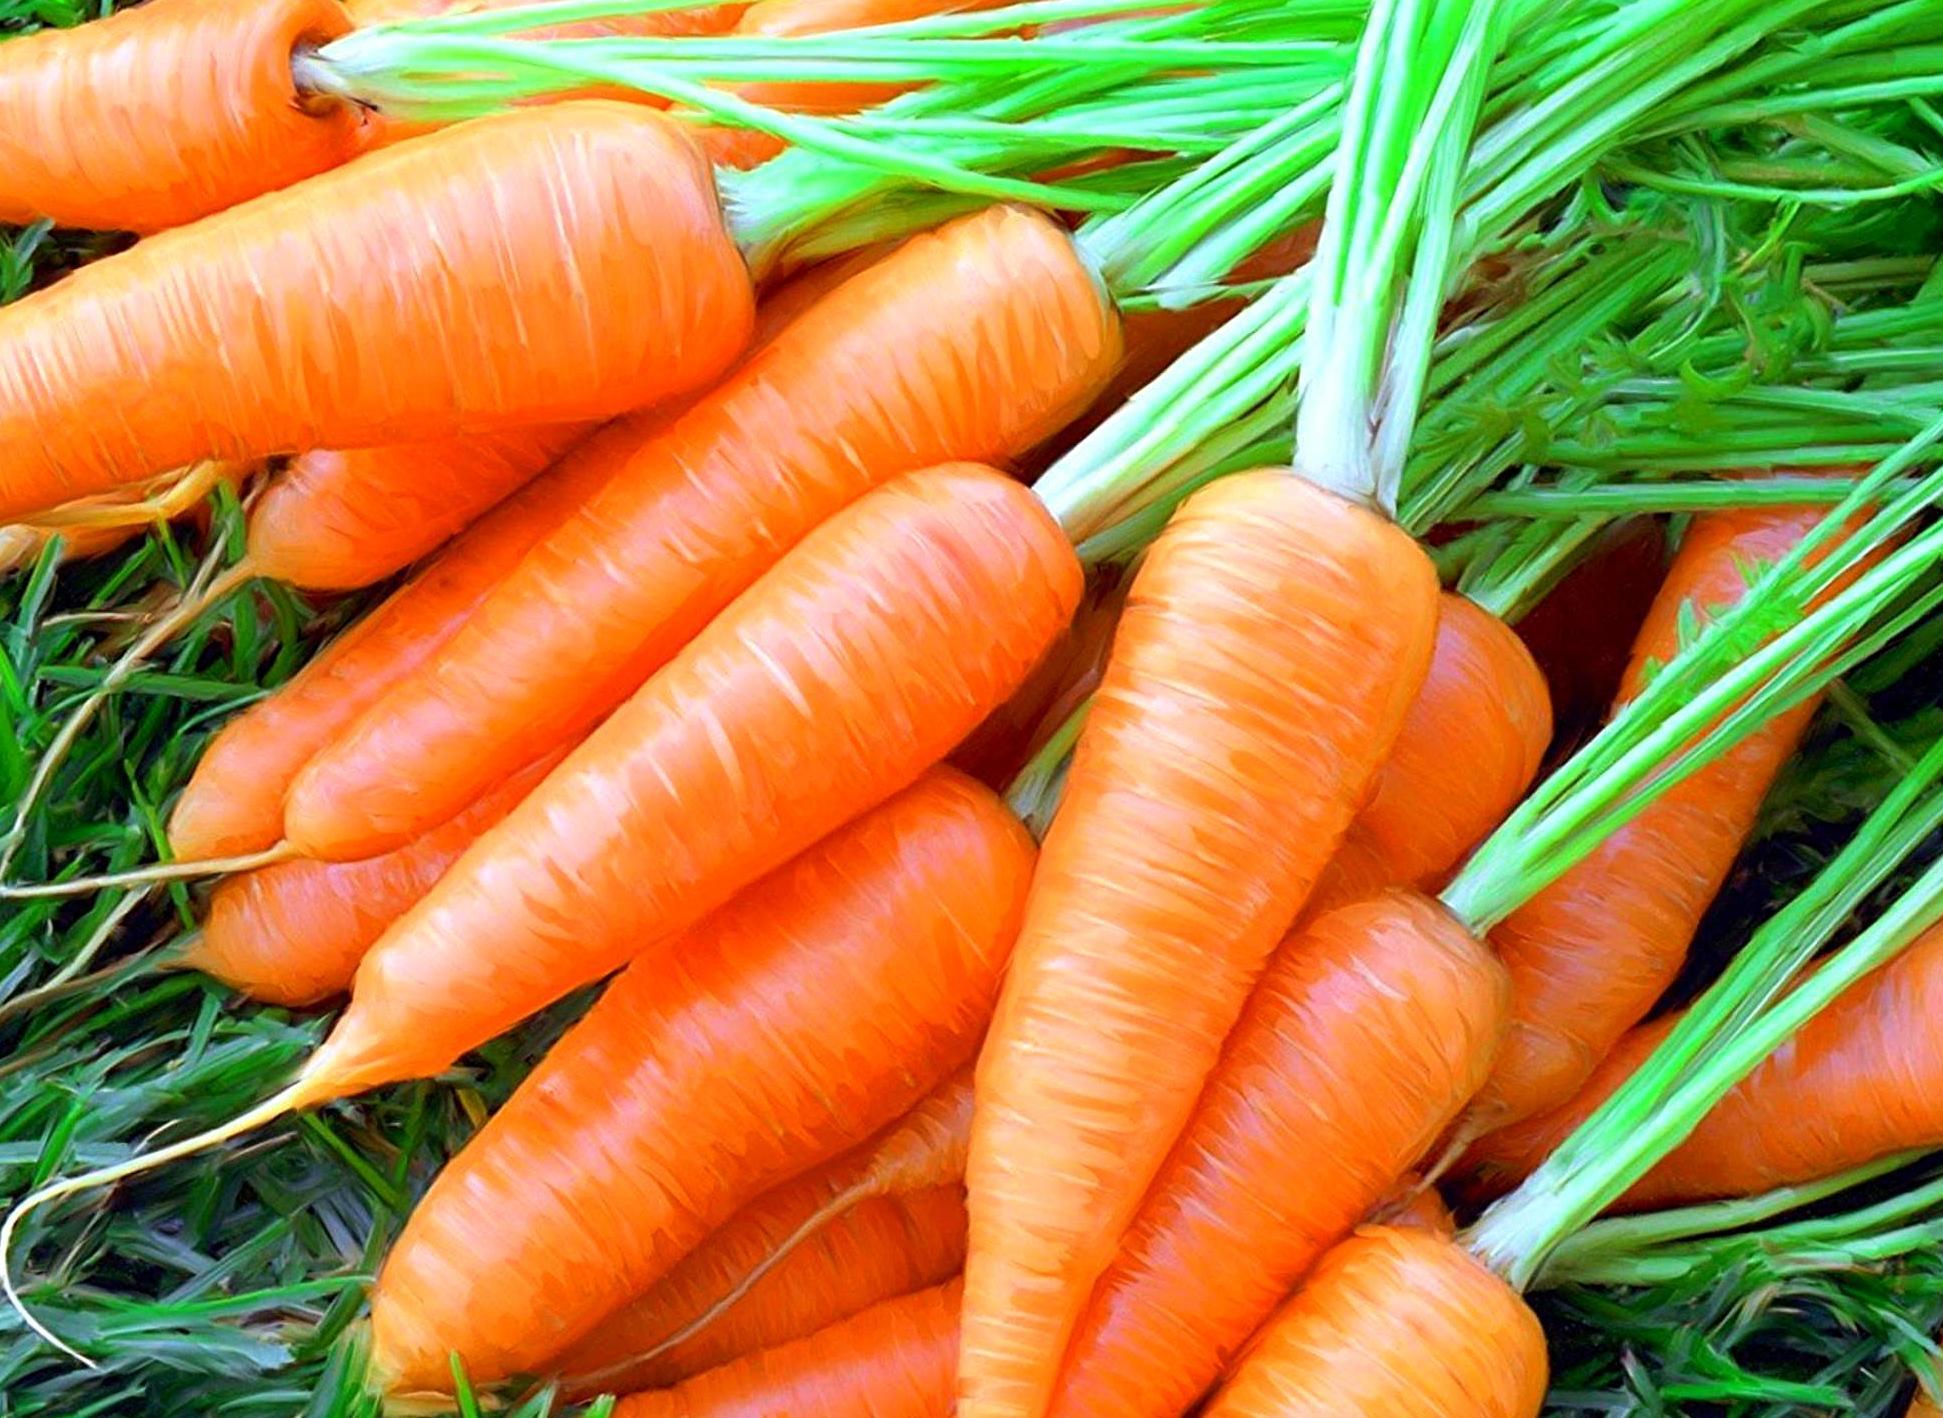 операции проводятся картинки подсолнуха вишни моркови рисунок